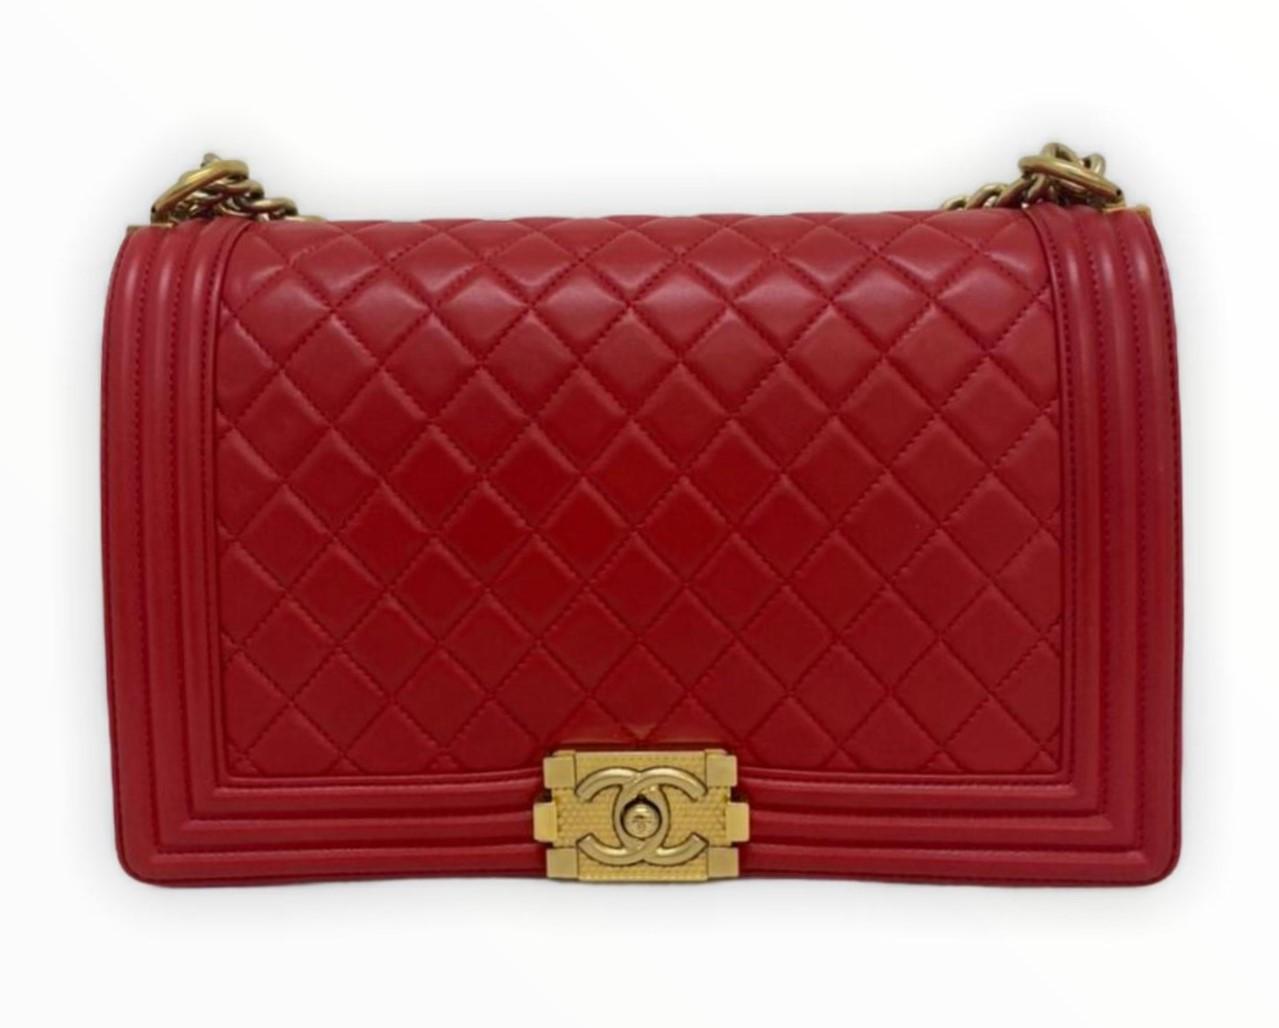 Bolsa Chanel Boy Vermelha Lambskin